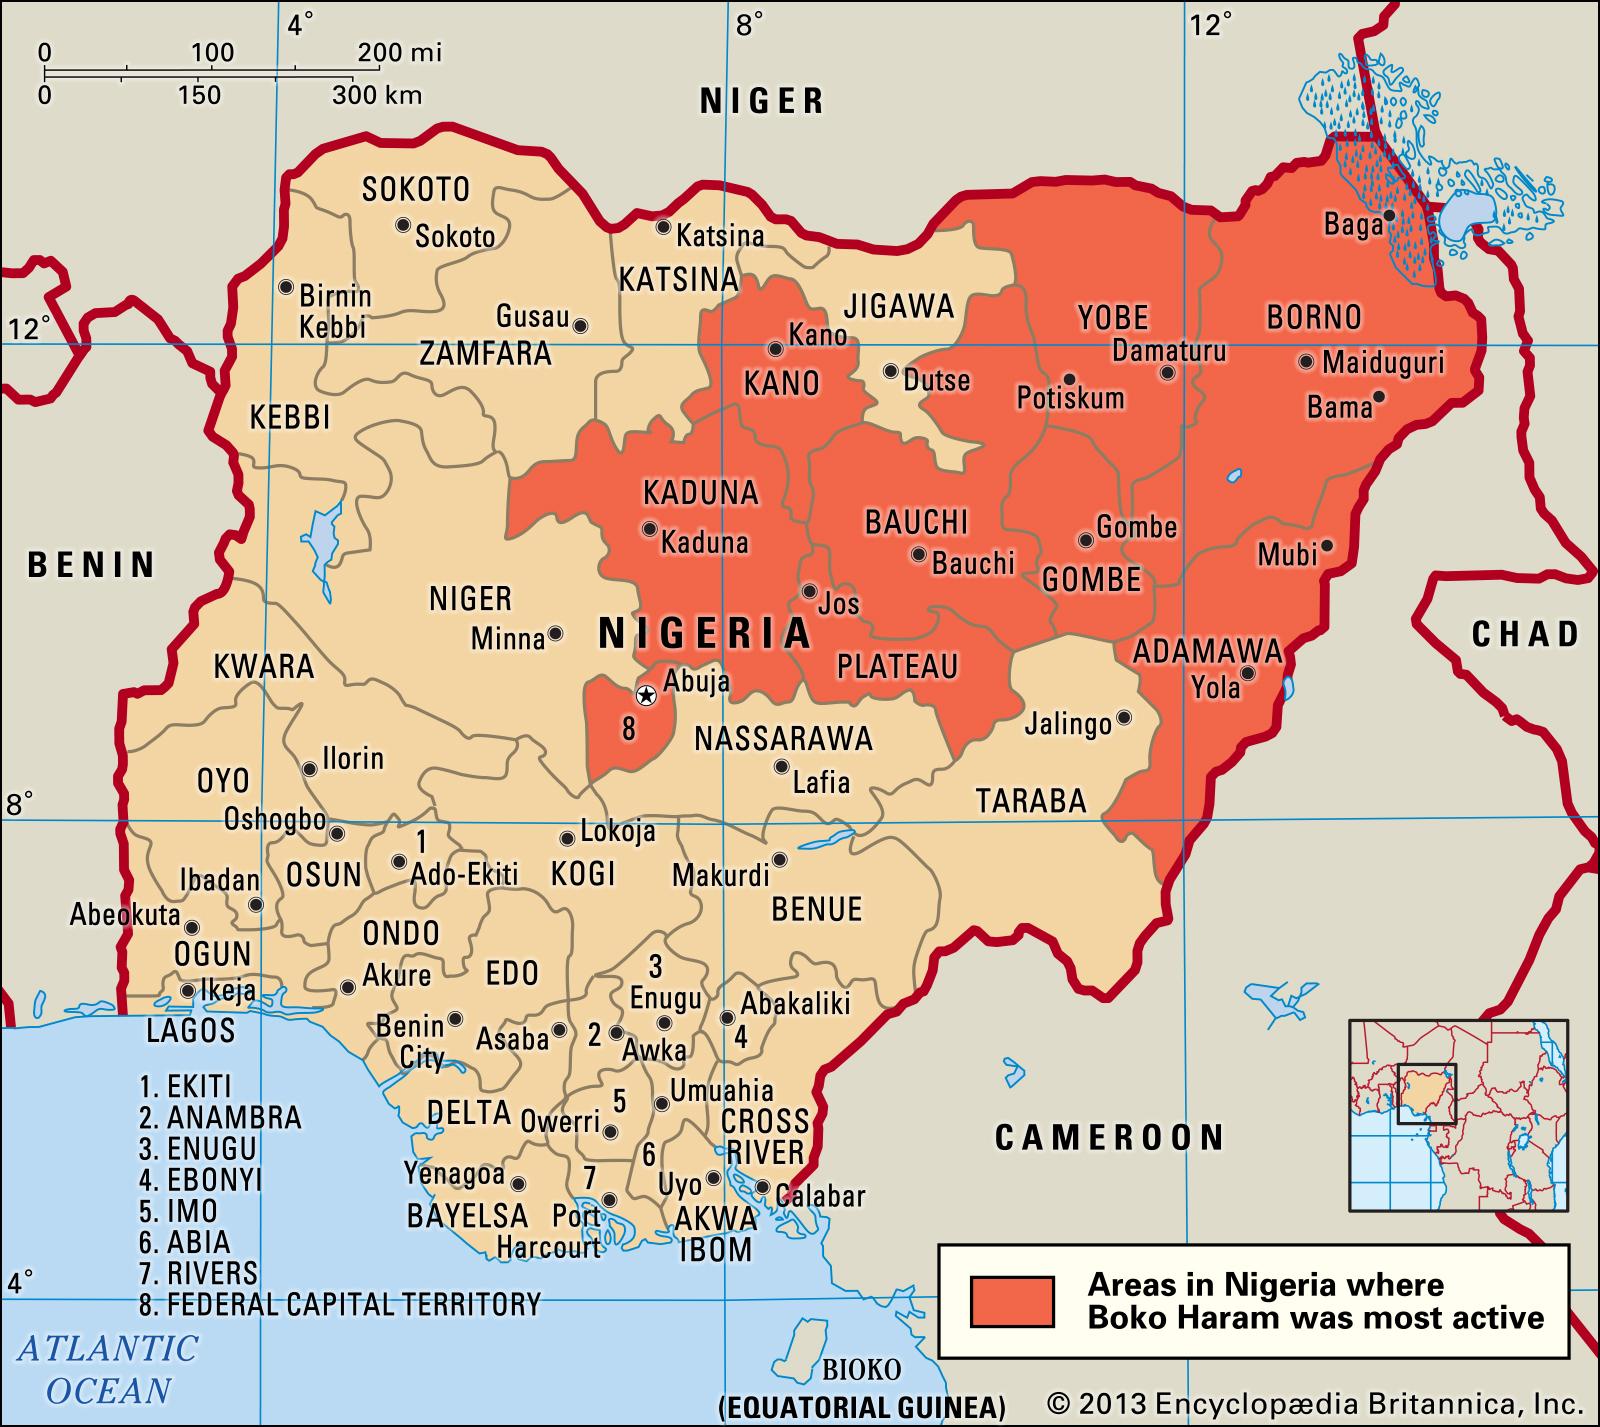 Nigeria-Areas-Boko-Haram